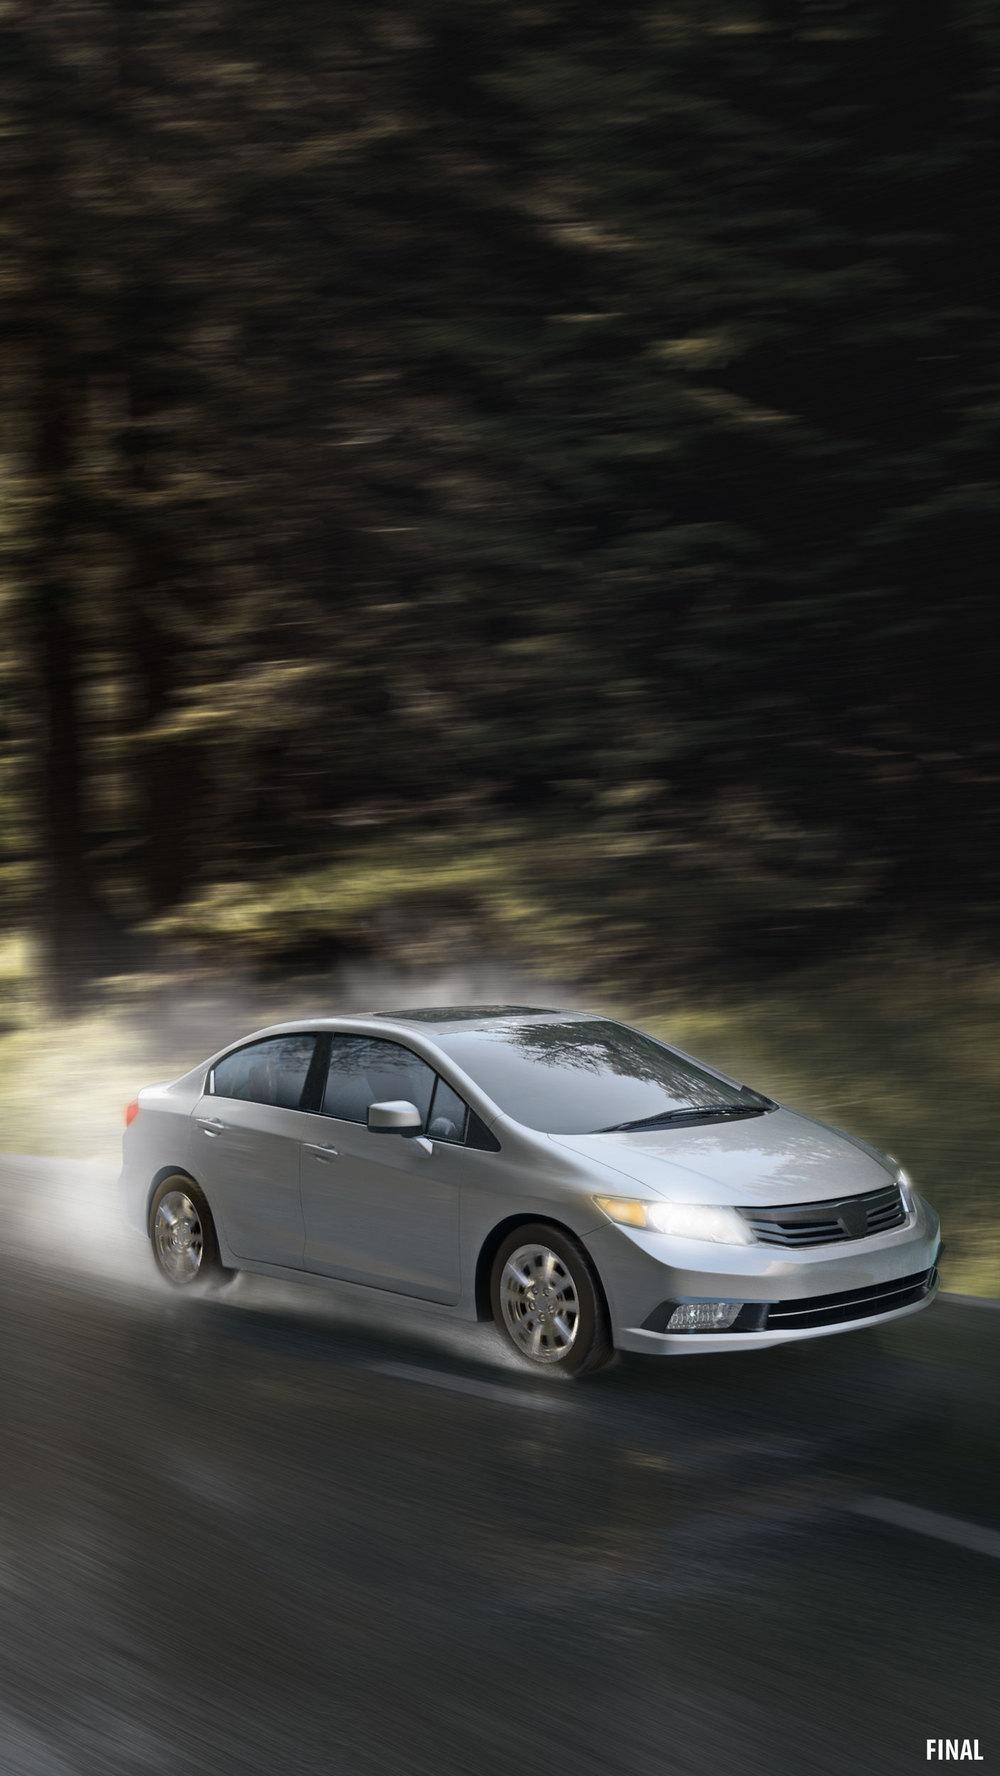 composite image of car driving through rain